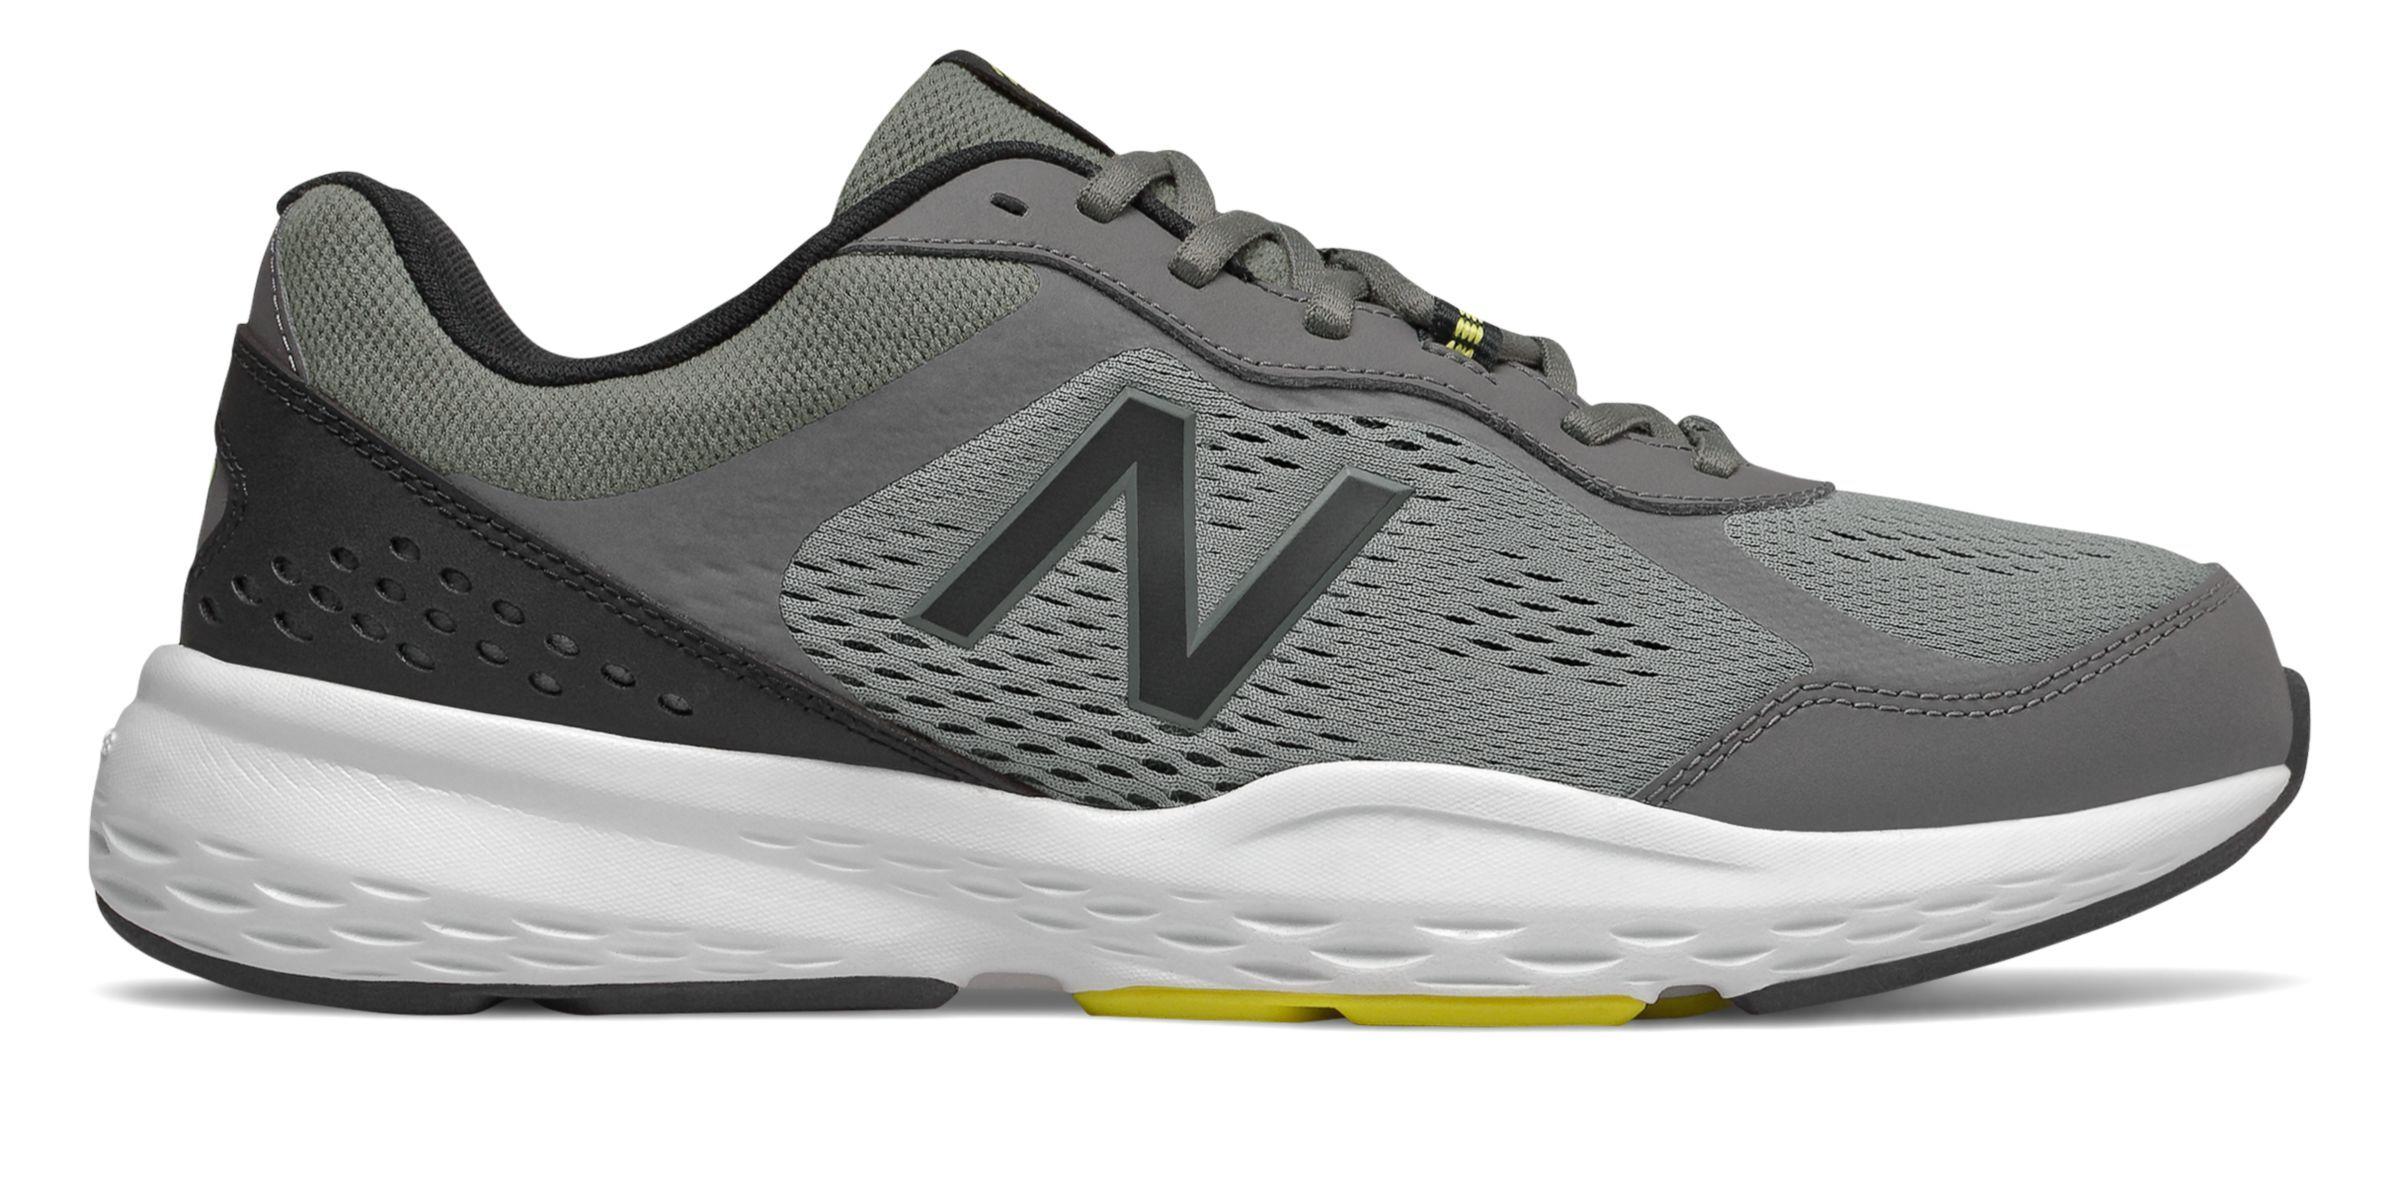 New Balance Men's 517v2 Shoes Grey  - Grey - Size: 9